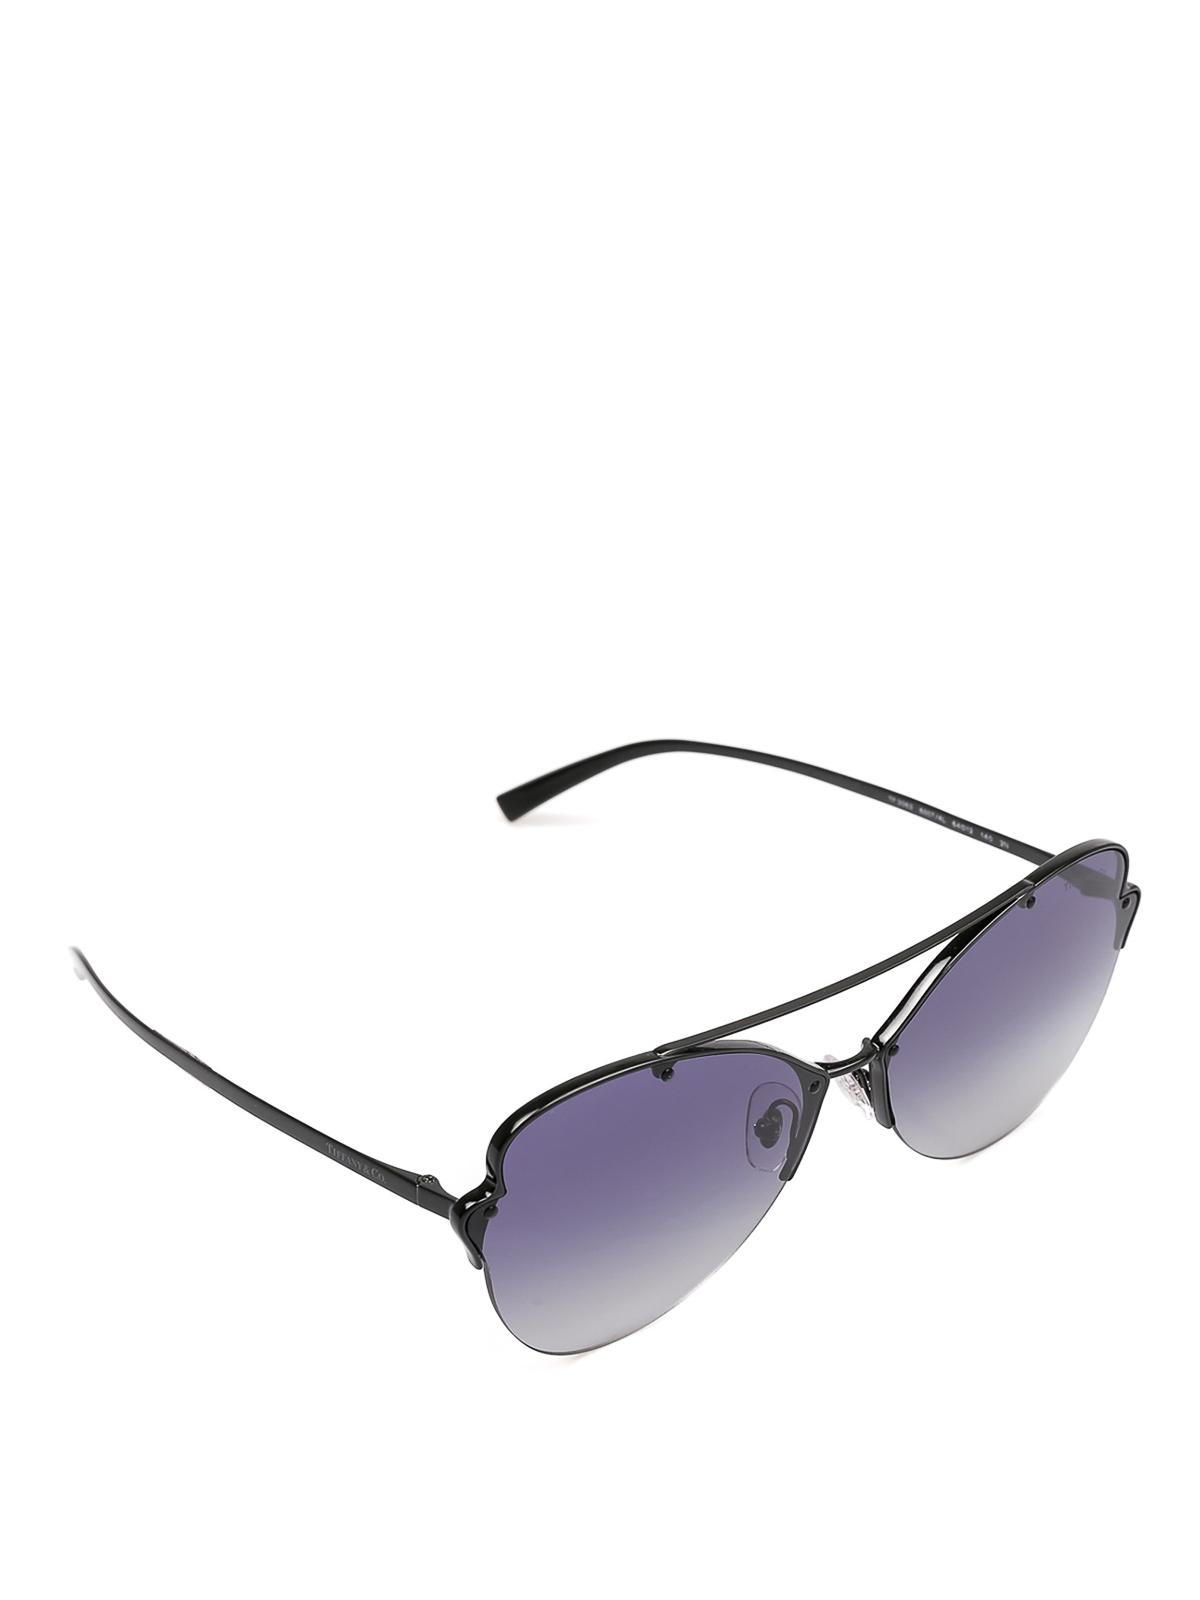 4bdc7d4723d7 Tiffany & Co. - Black metal Butterfly sunglasses - sunglasses ...